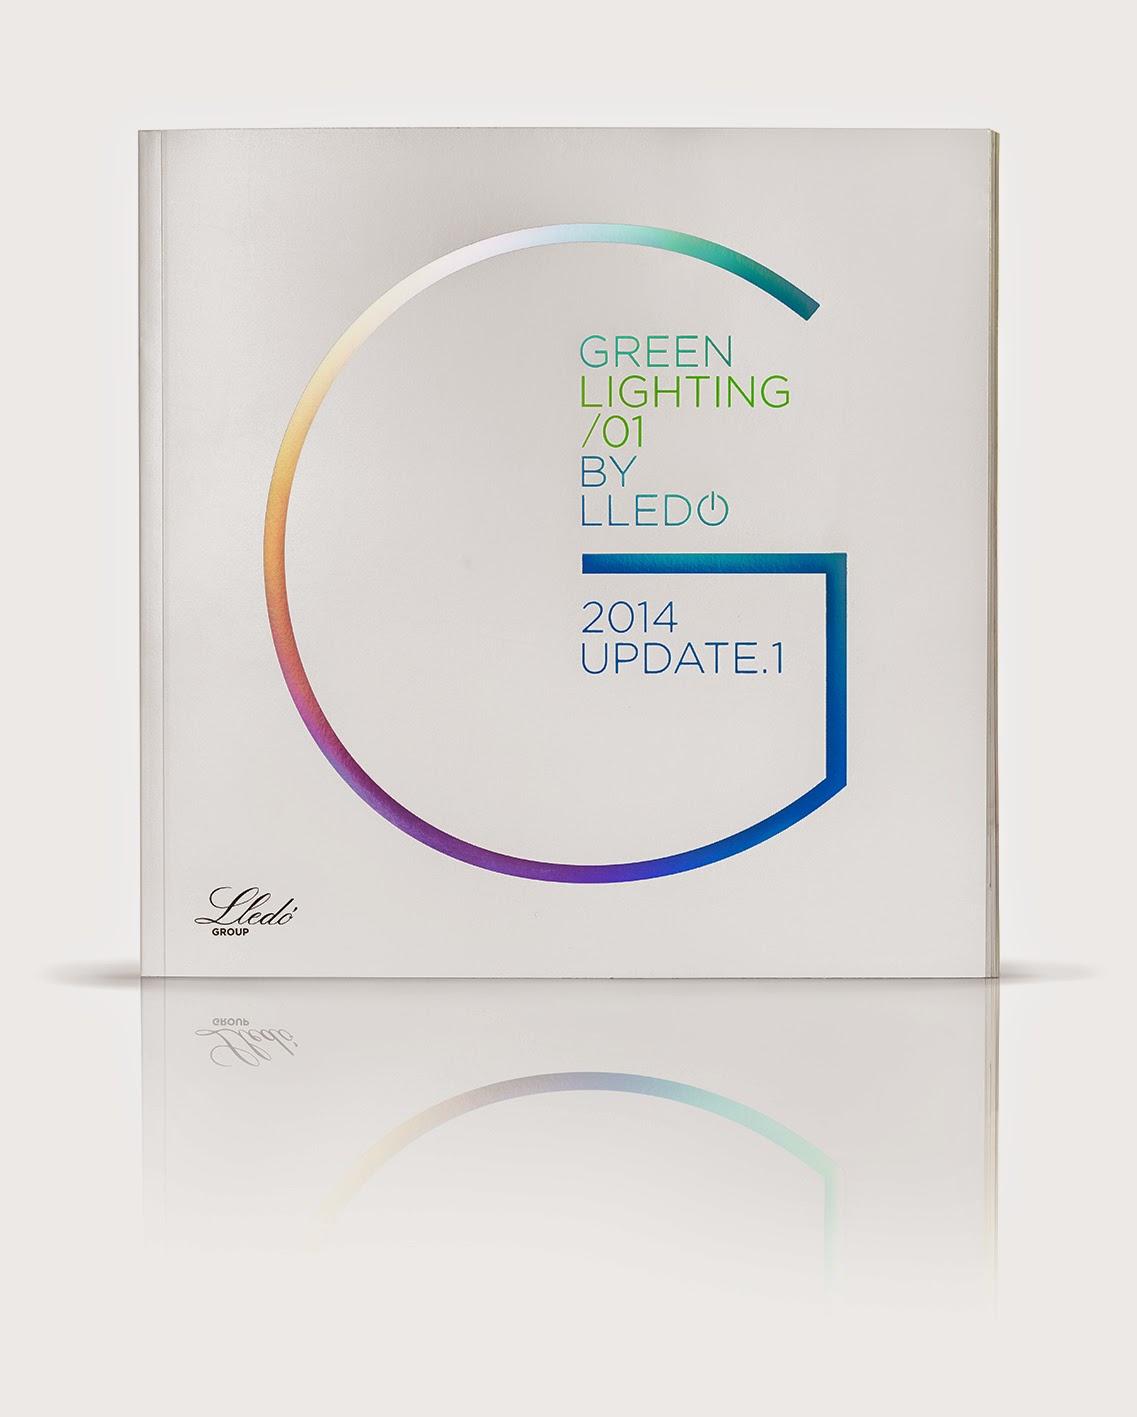 http://www.lledosa.com/userfiles/file/Update_Green_esp.pdf